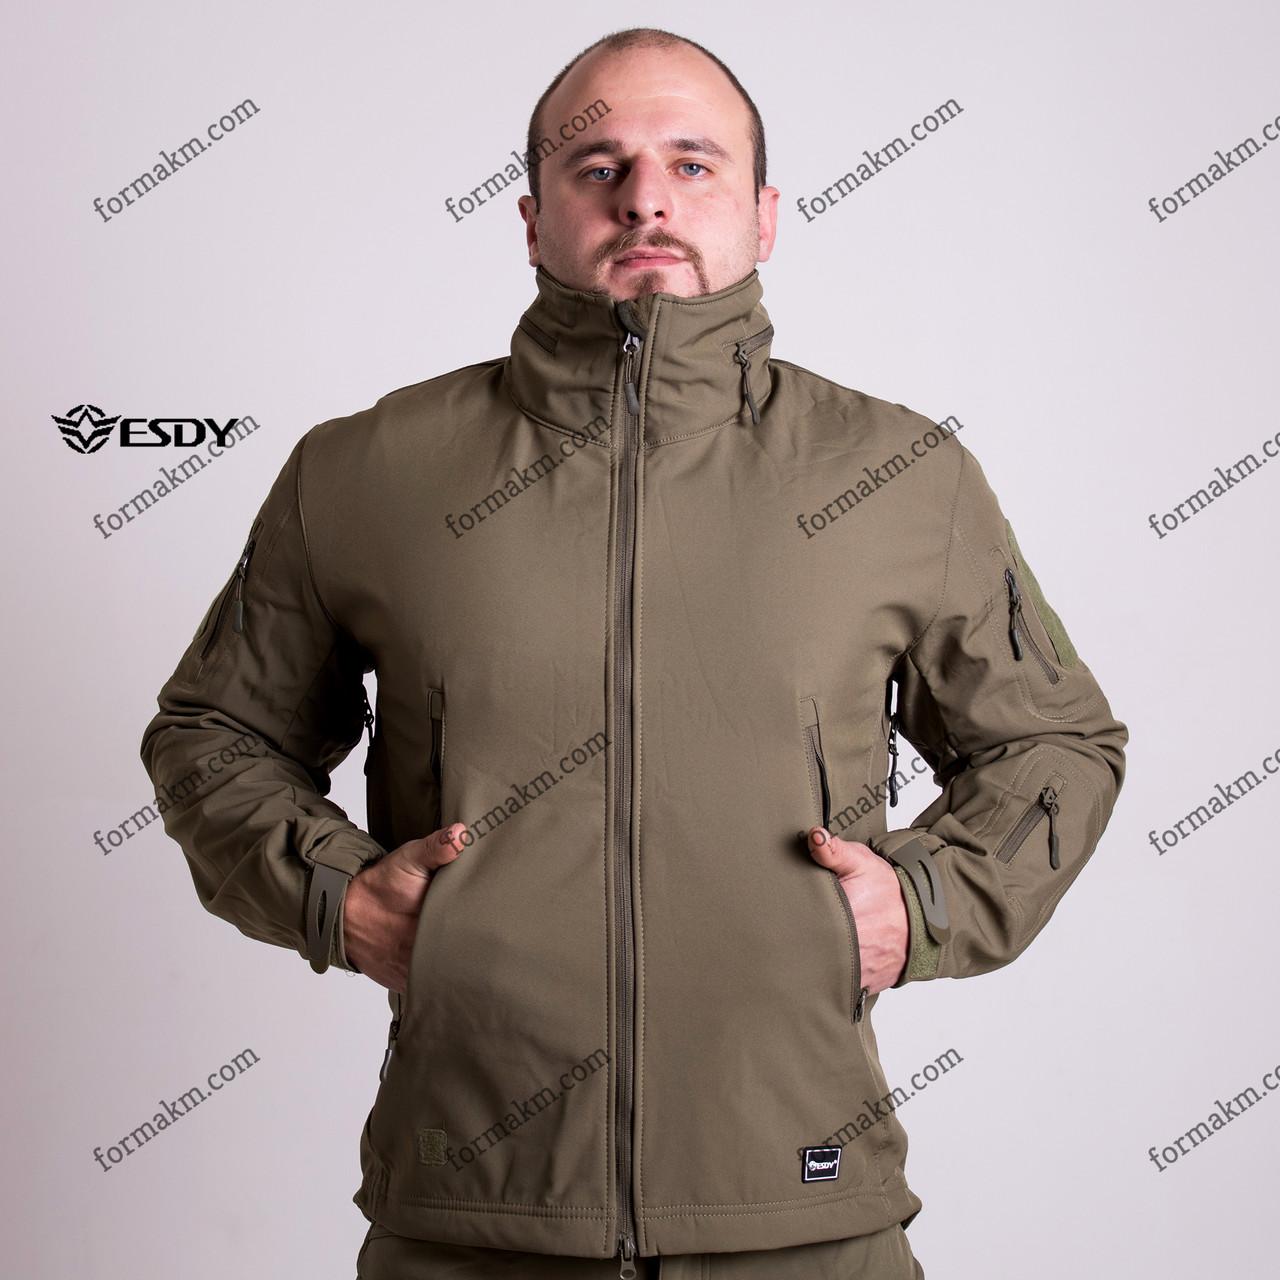 Тактическая куртка на флисе ESDY SoftShell Tactic Olive